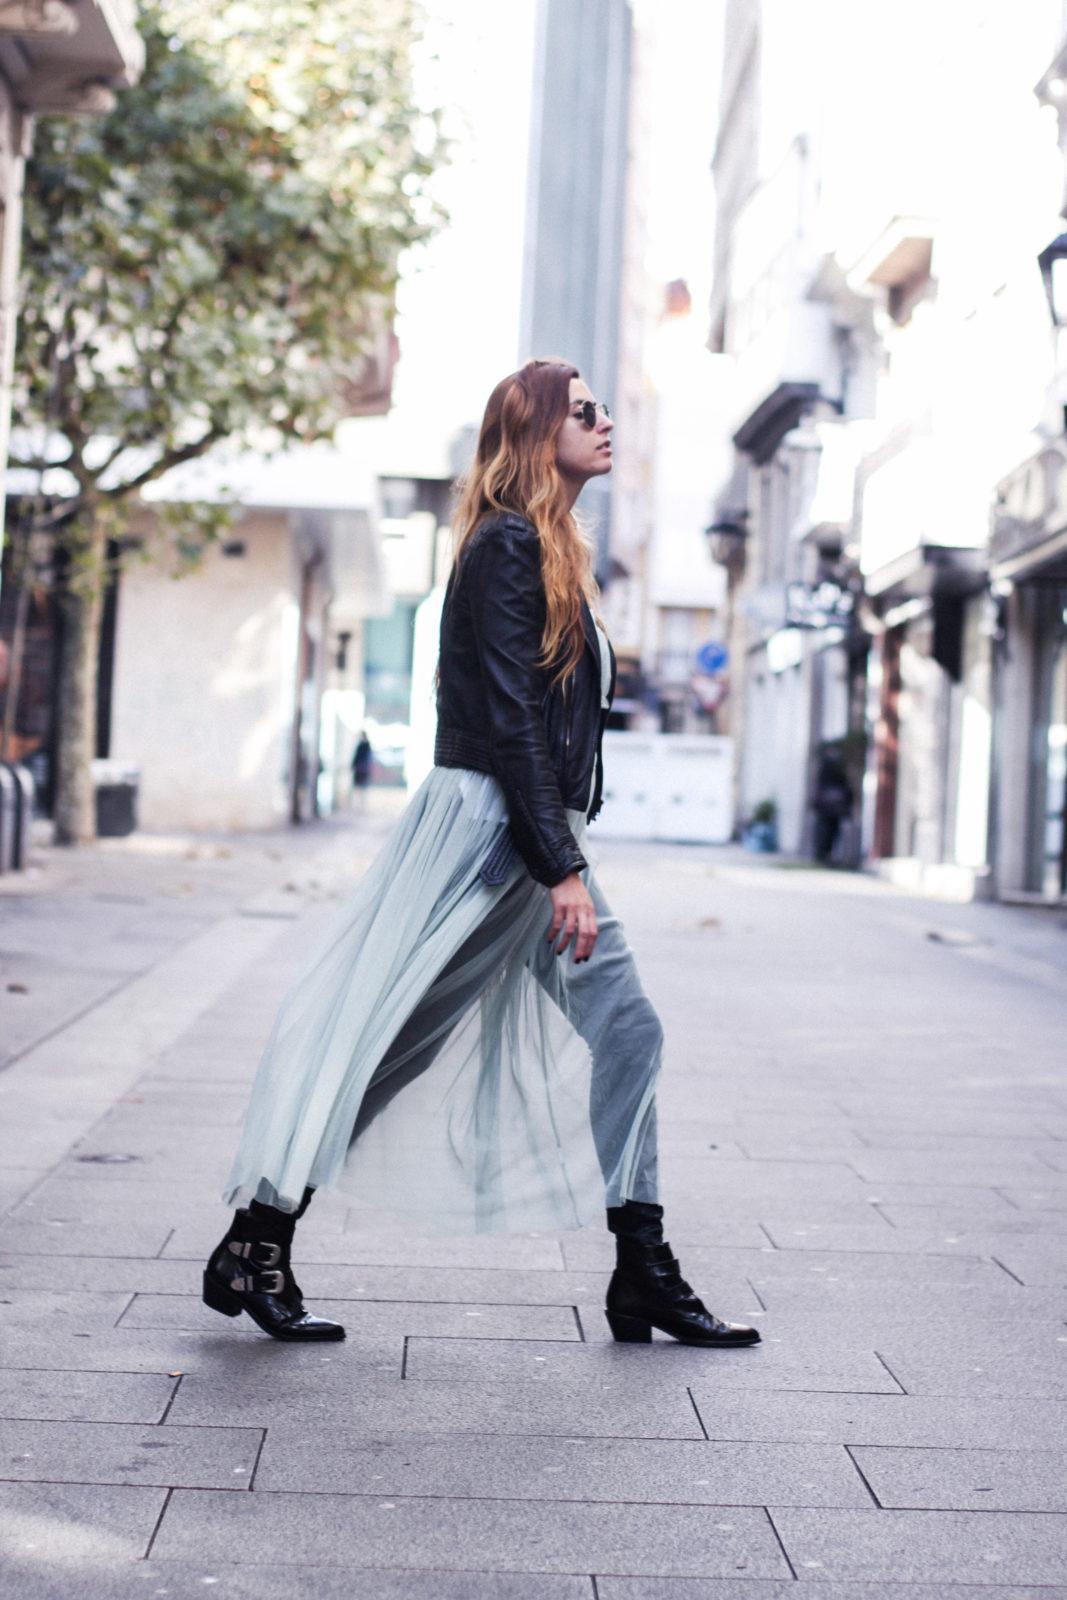 vestido-de-tul-cazadora-biker-botines-con-hebillas-collar-choker-happilles-boutique-vestido-mas-camiseta-tendencias-2016-estilo-bailarina-street-style-donkeycool-30